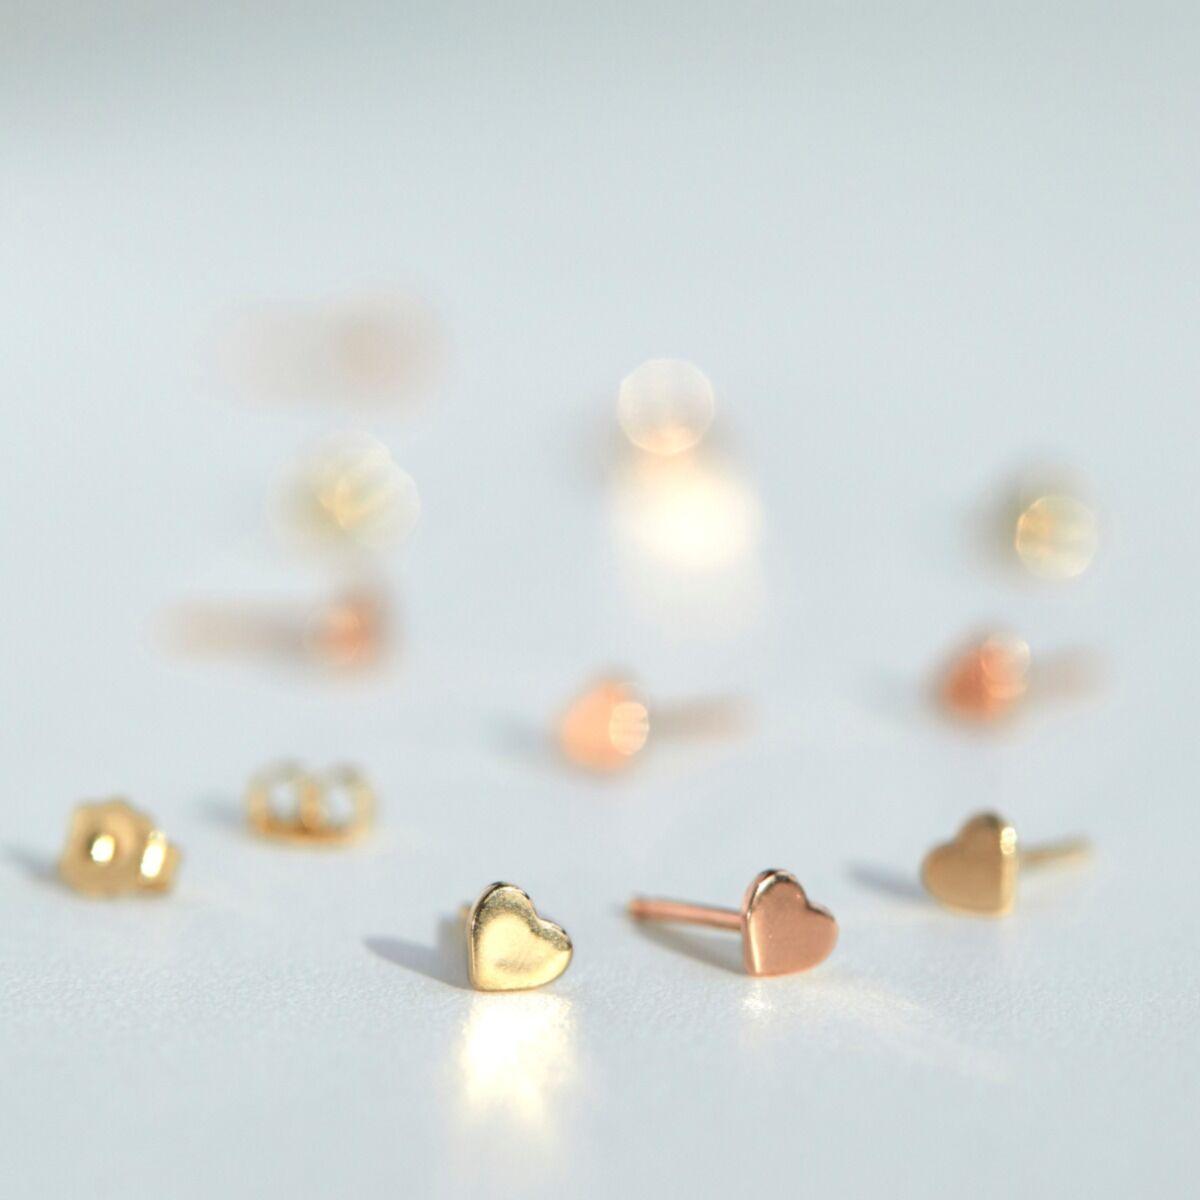 Classic Heart Stud, yellow gold (single) image